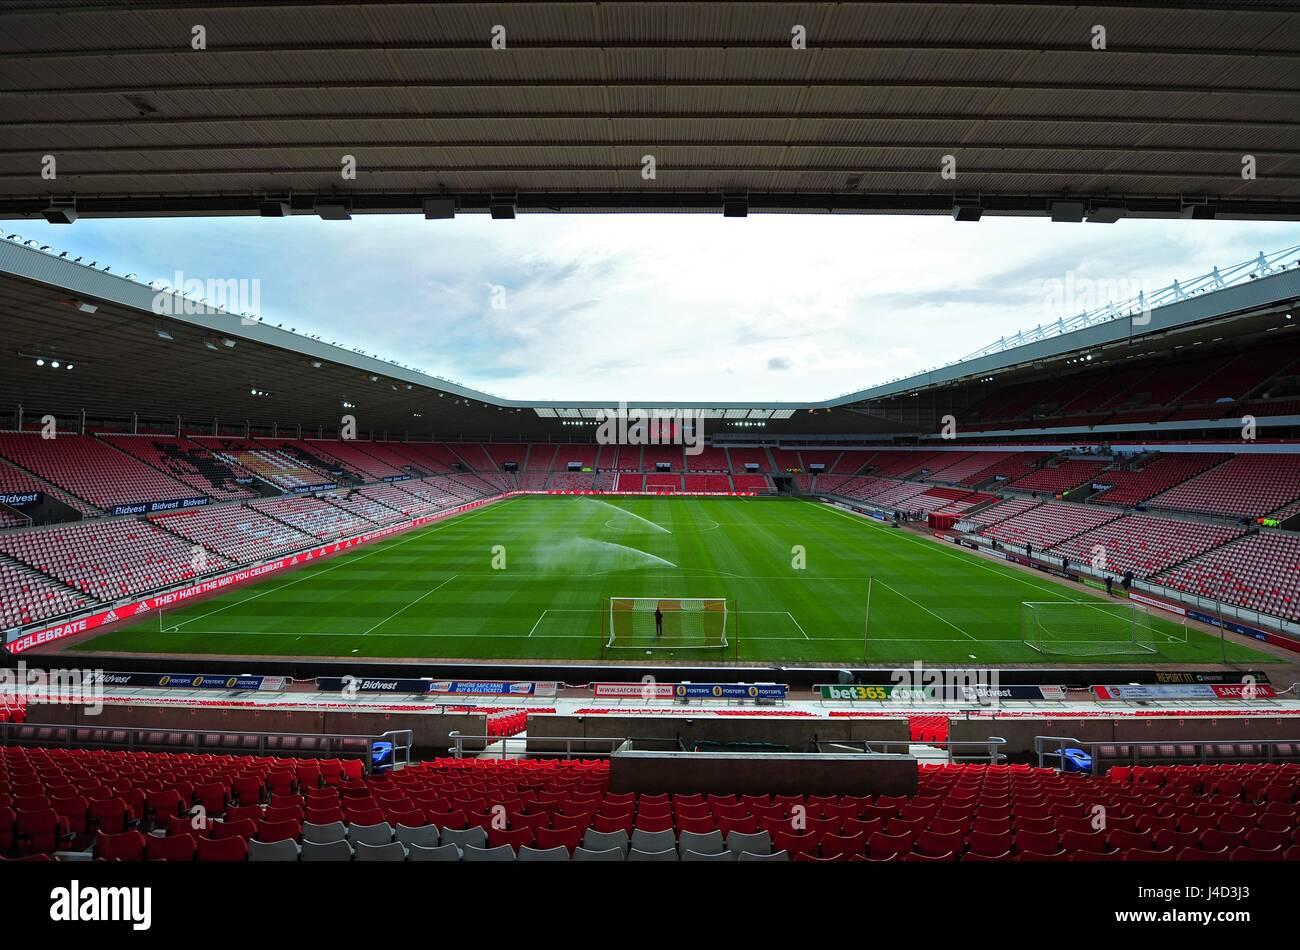 STADIUM OF LLIGHT SUNDERLAND FC V SOUTHAMPTON STADIUM OF LIGHT SUNDERLAND ENGLAND 02 May 2015 Stock Photo